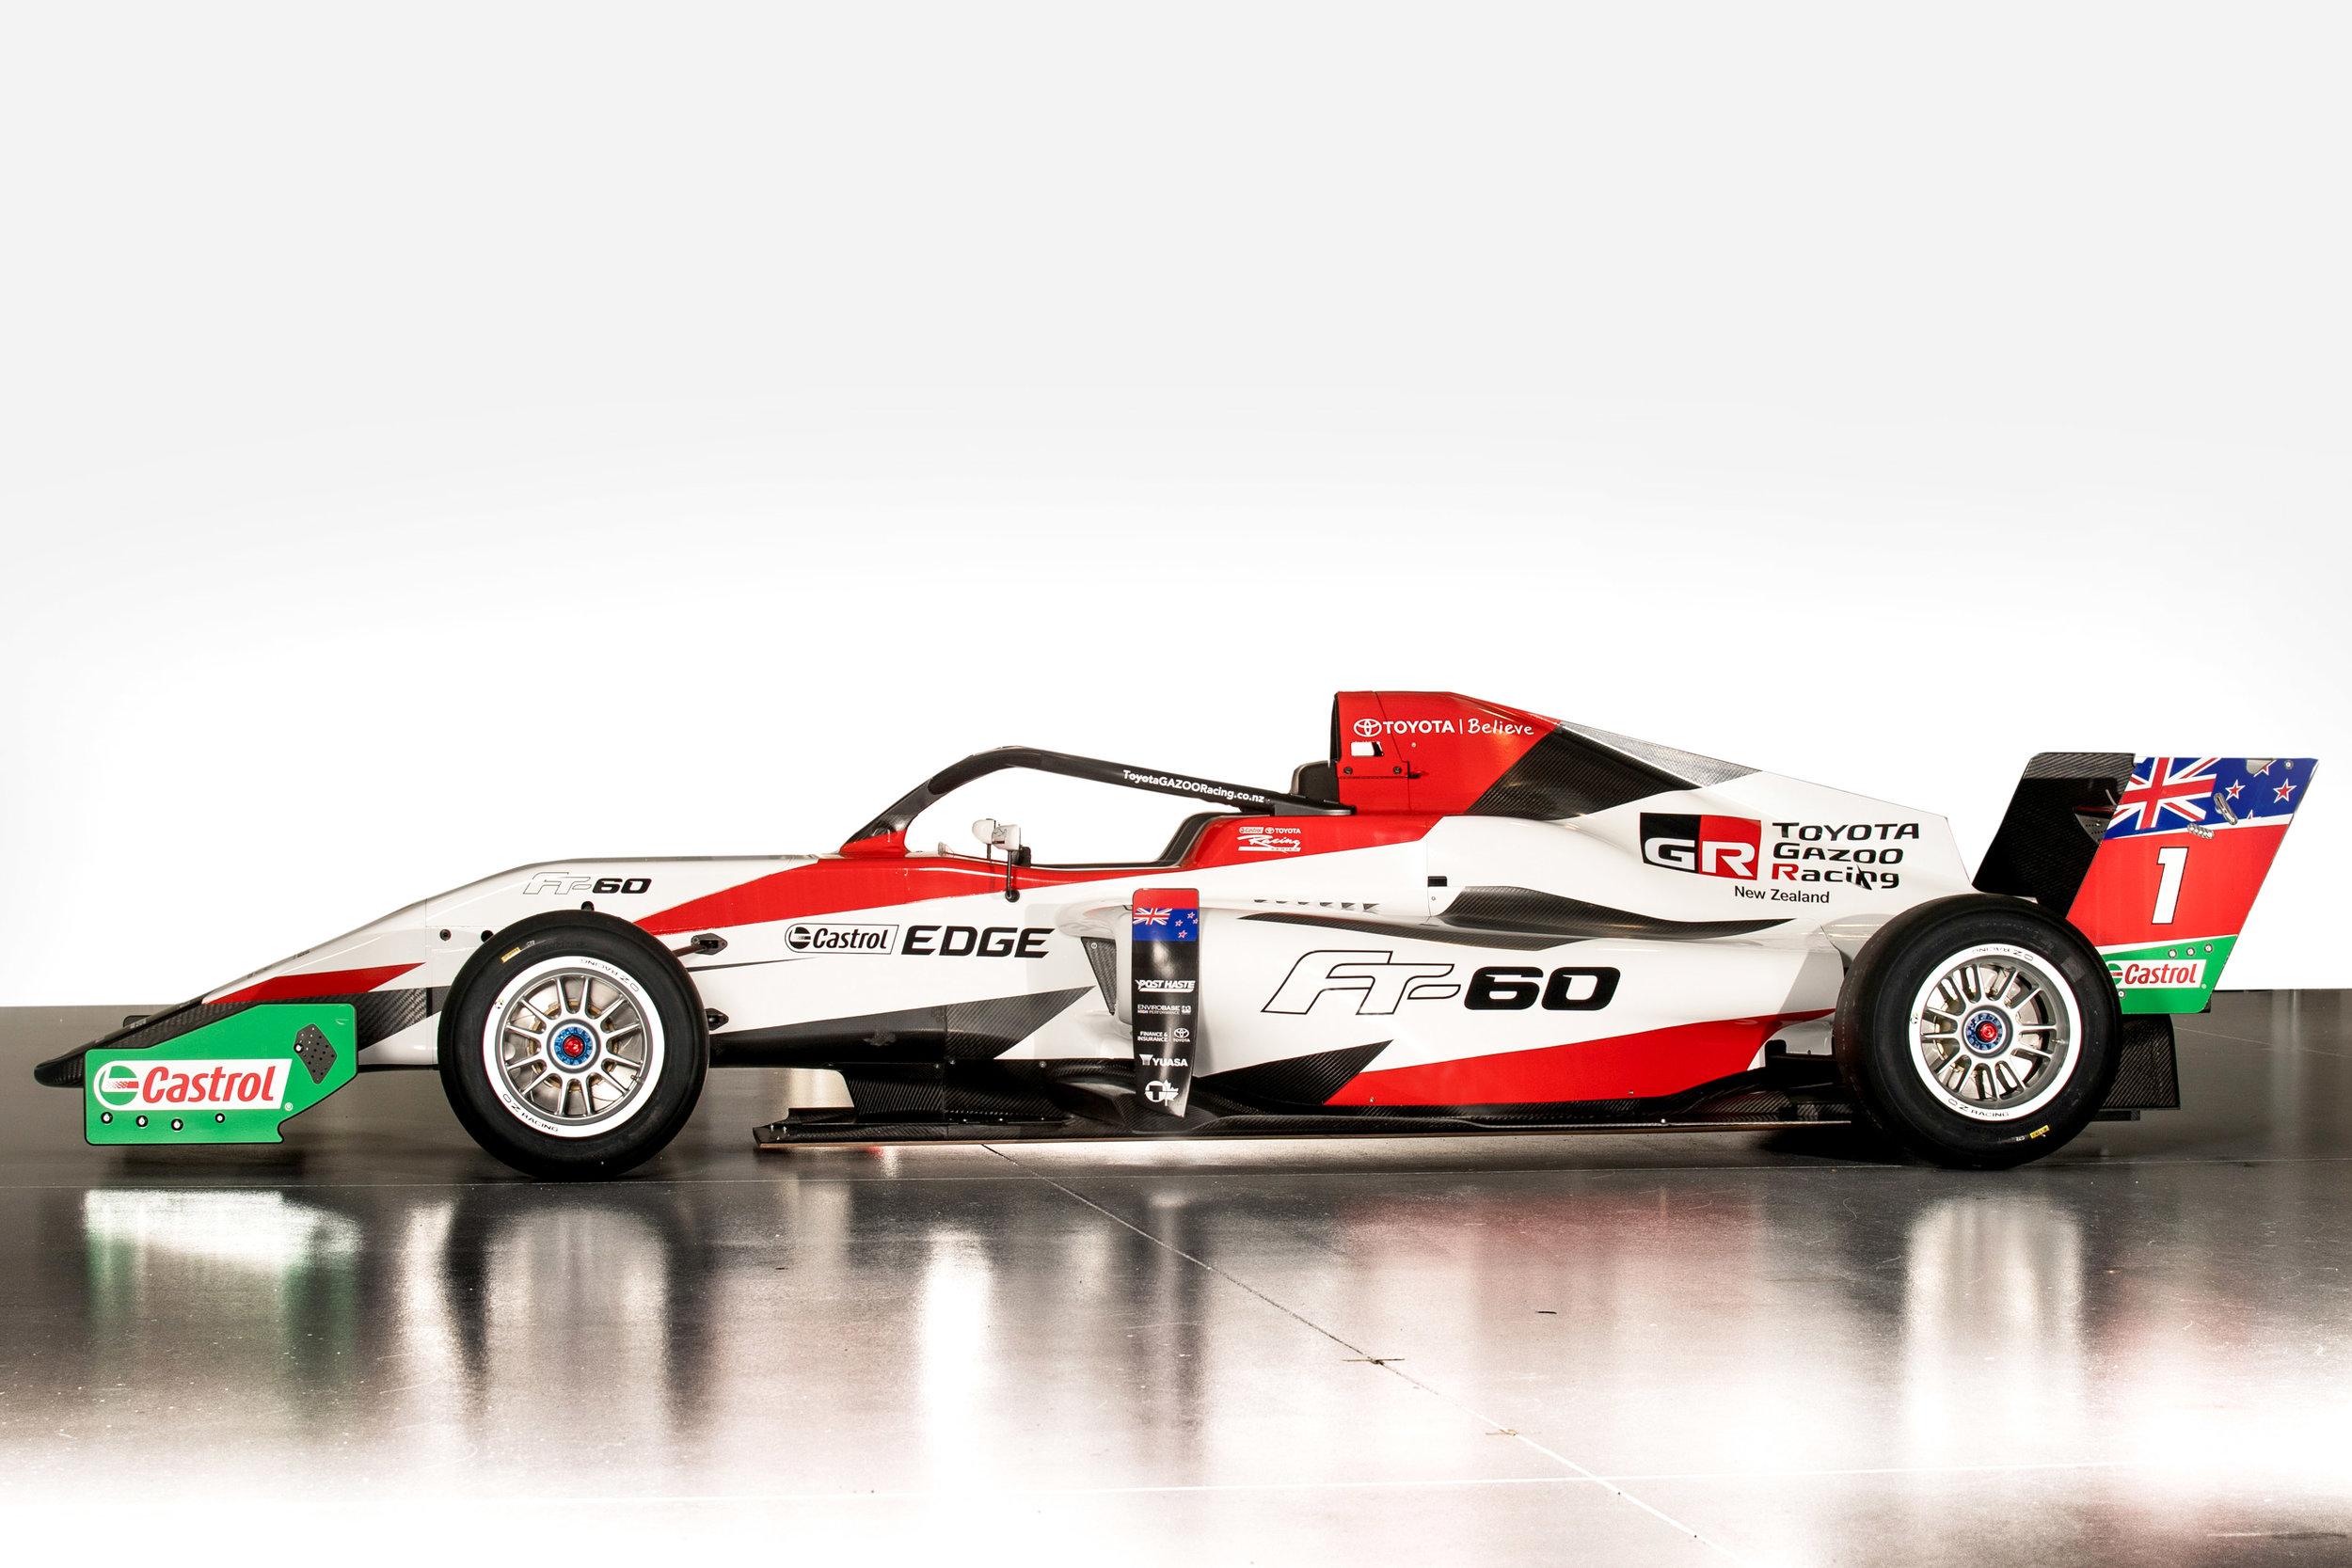 BJP Gazoo Racing -.jpg